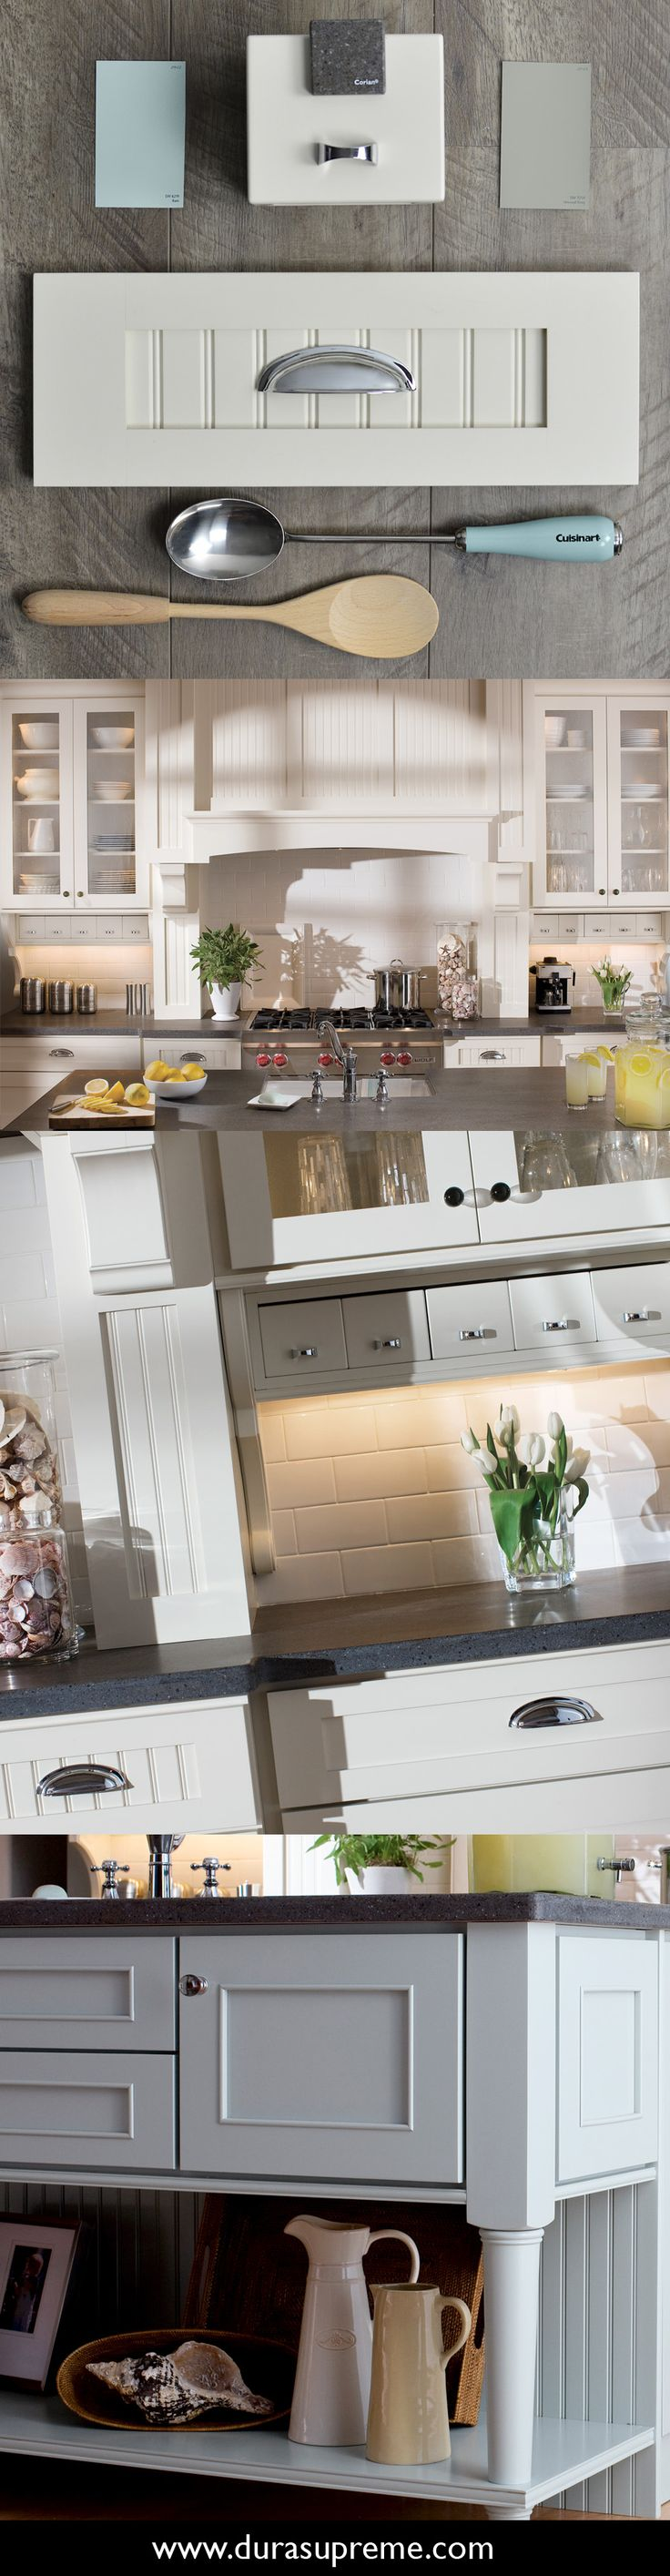 427 best kitchen mantle images on pinterest dream kitchens